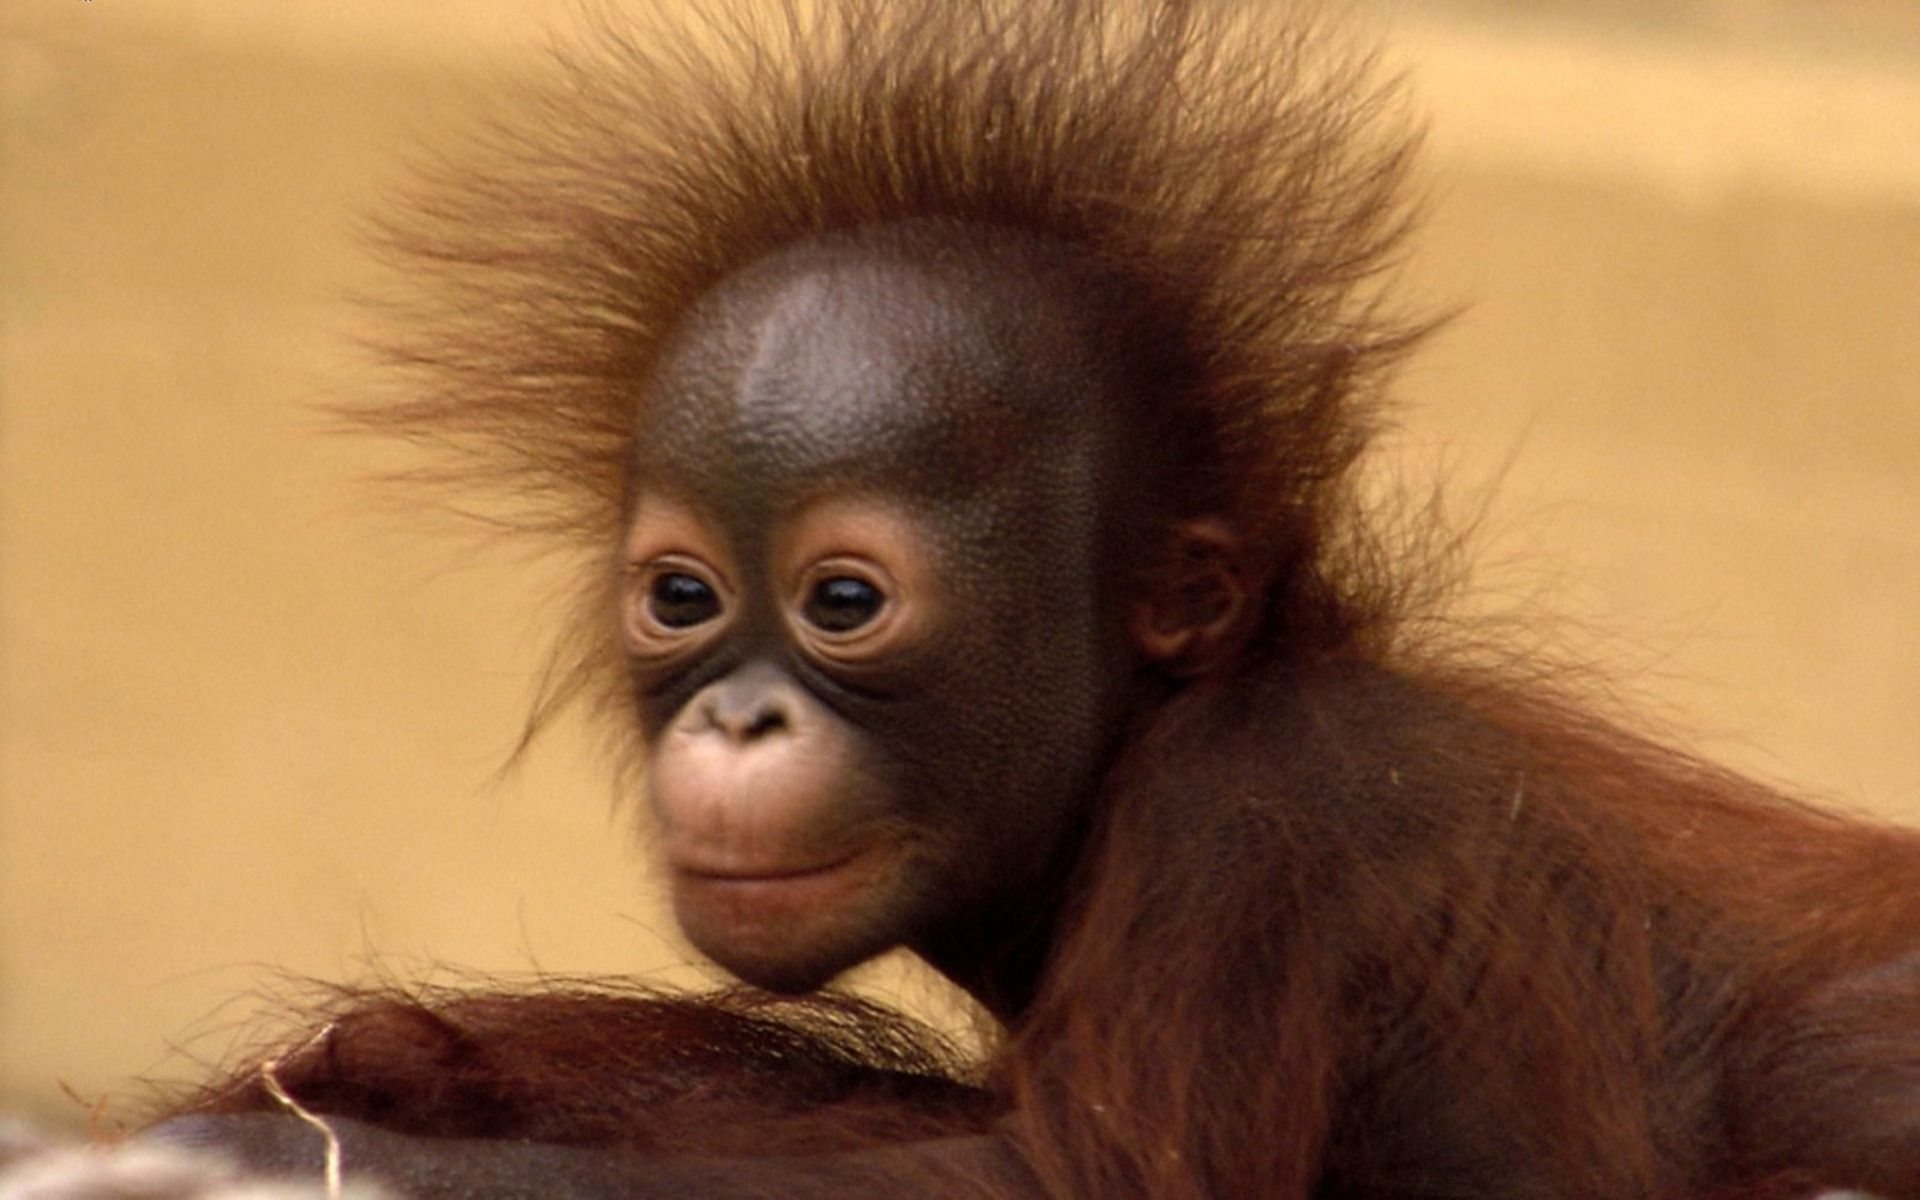 Baby Orangutans Baby Orangutan Cute Photoshd Wallpapersimages